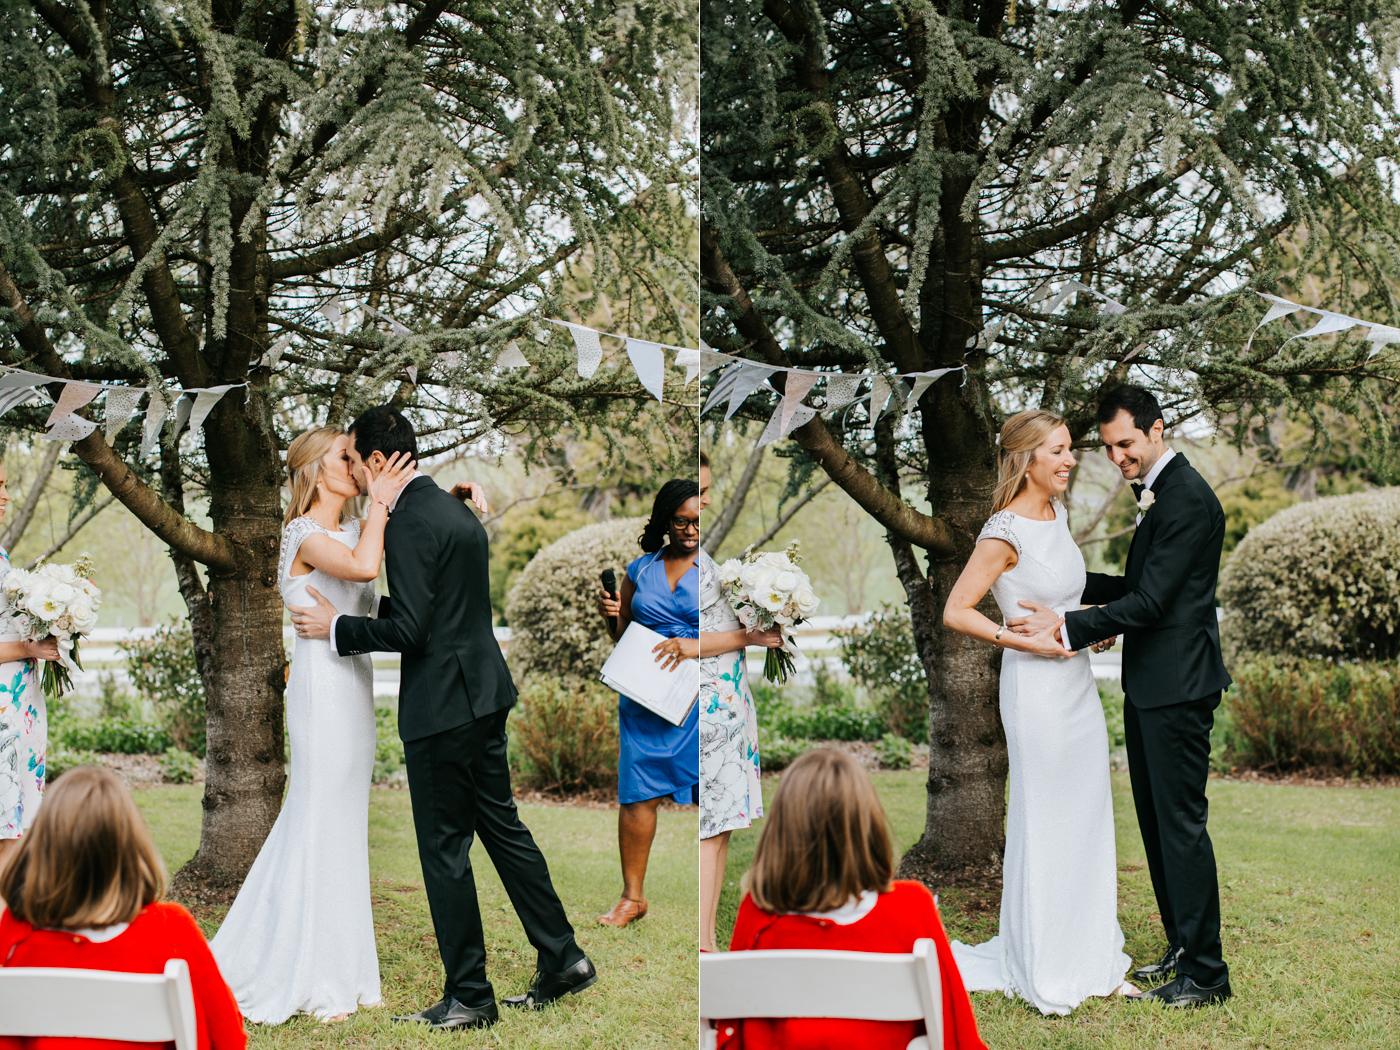 Bridget & James - Orange Country Wedding - Samantha Heather Photography-48.jpg